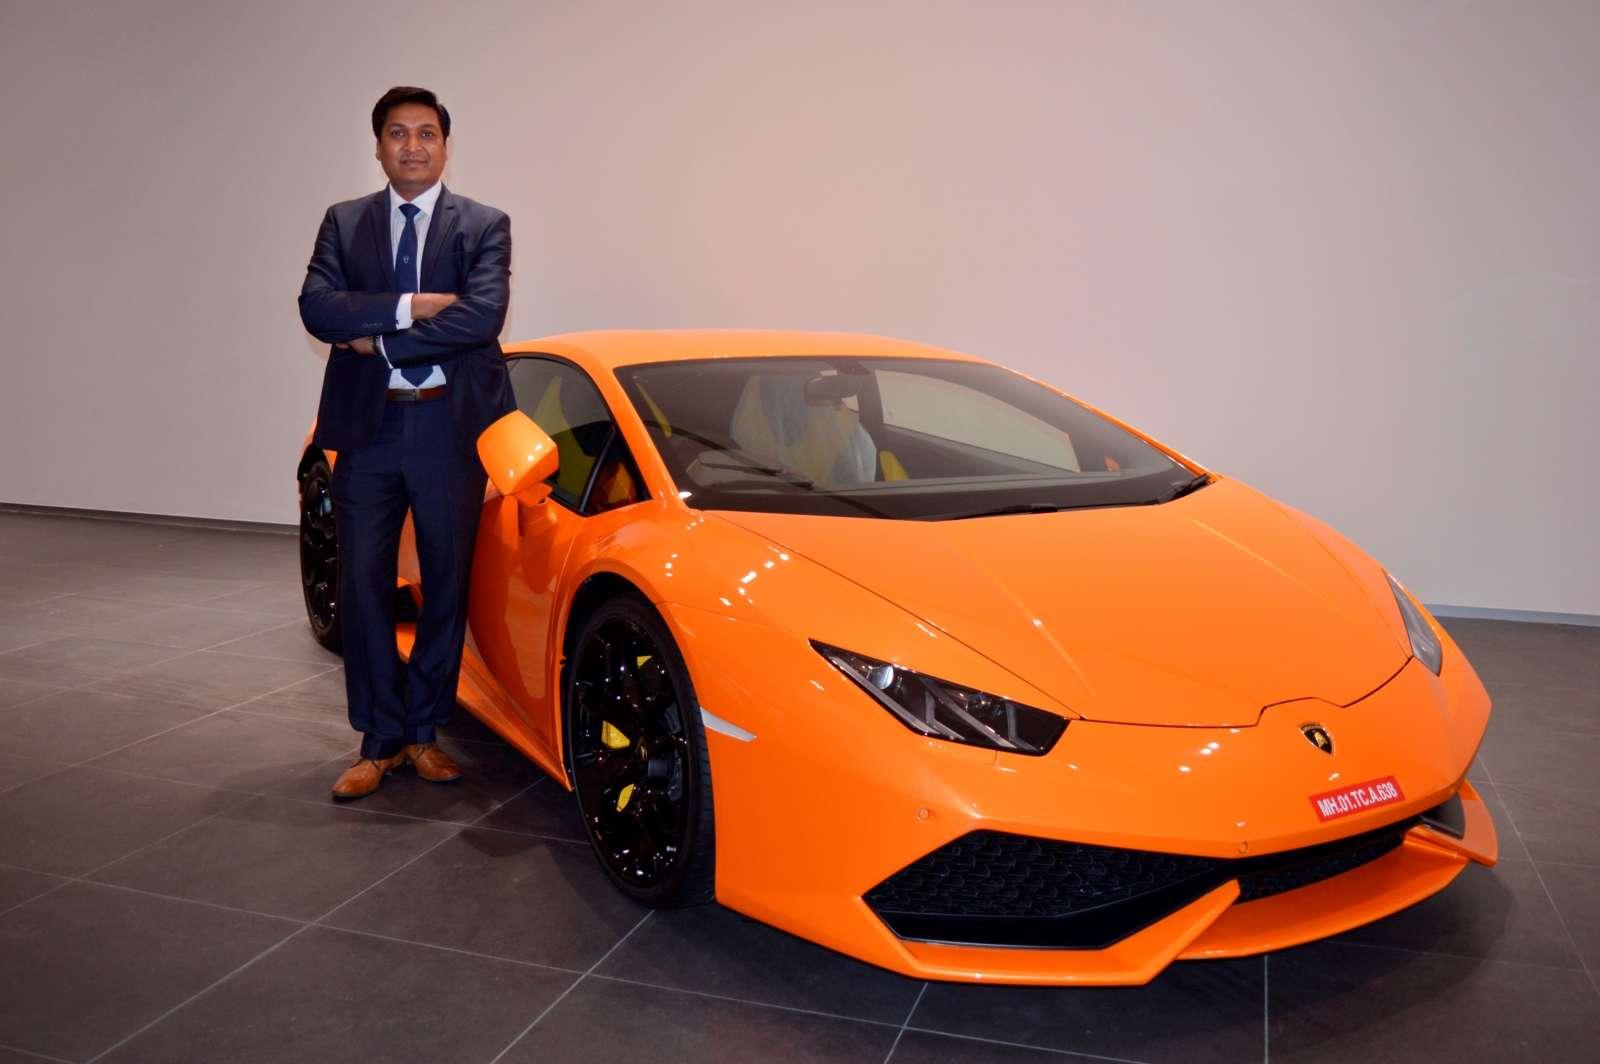 Sharad Agarwal Appointed As Head Of Lamborghini India